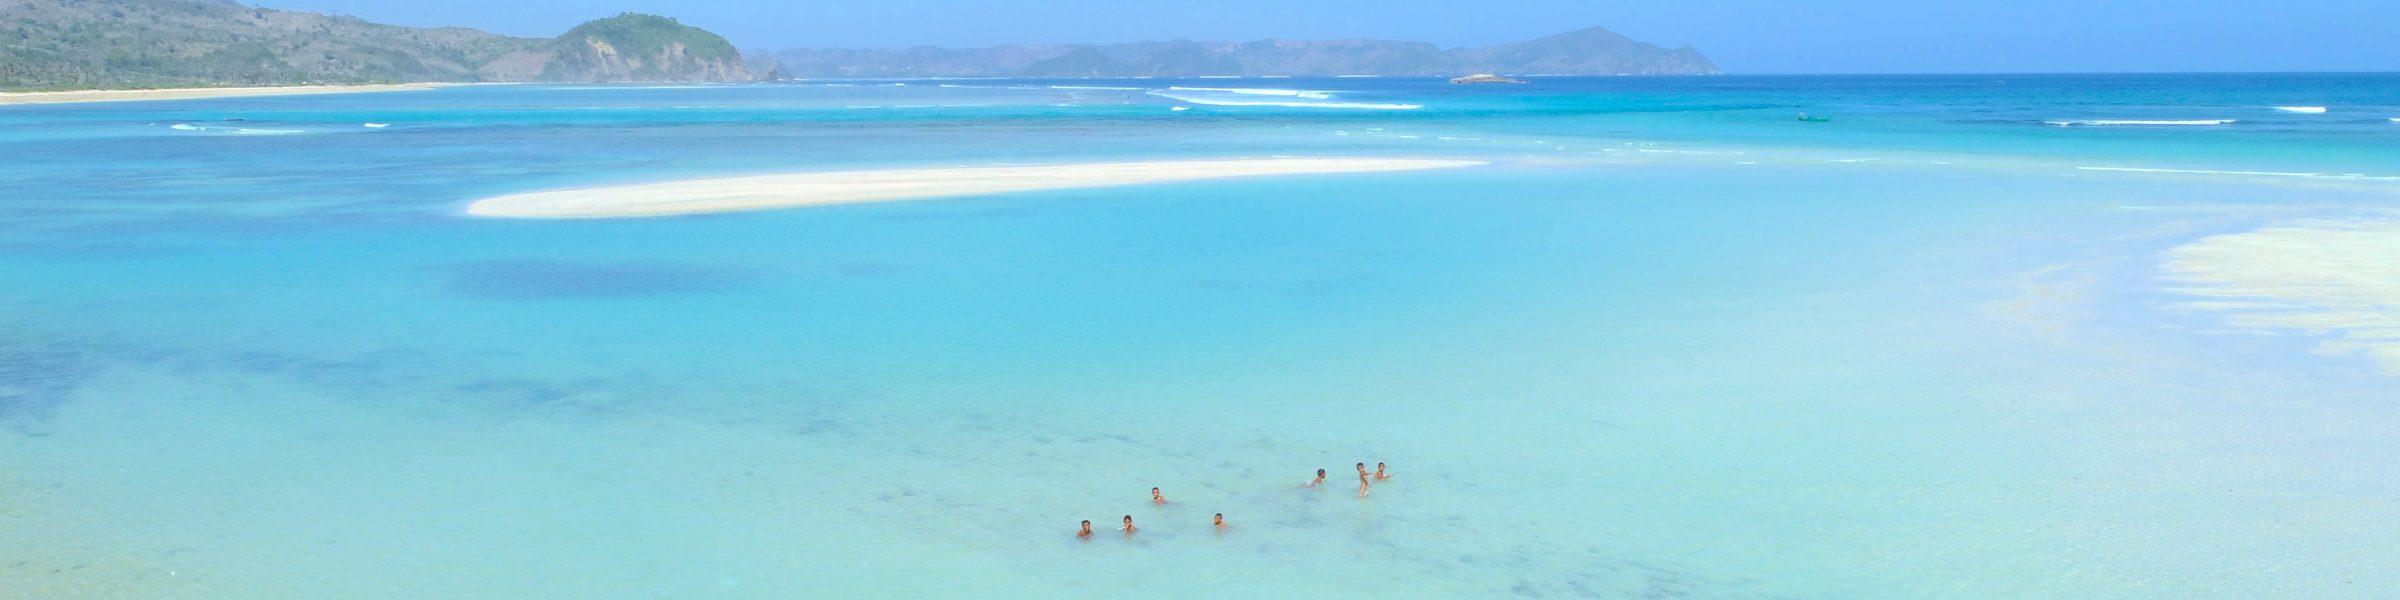 Pengantap Bay - Lombok Island   Invest Islands